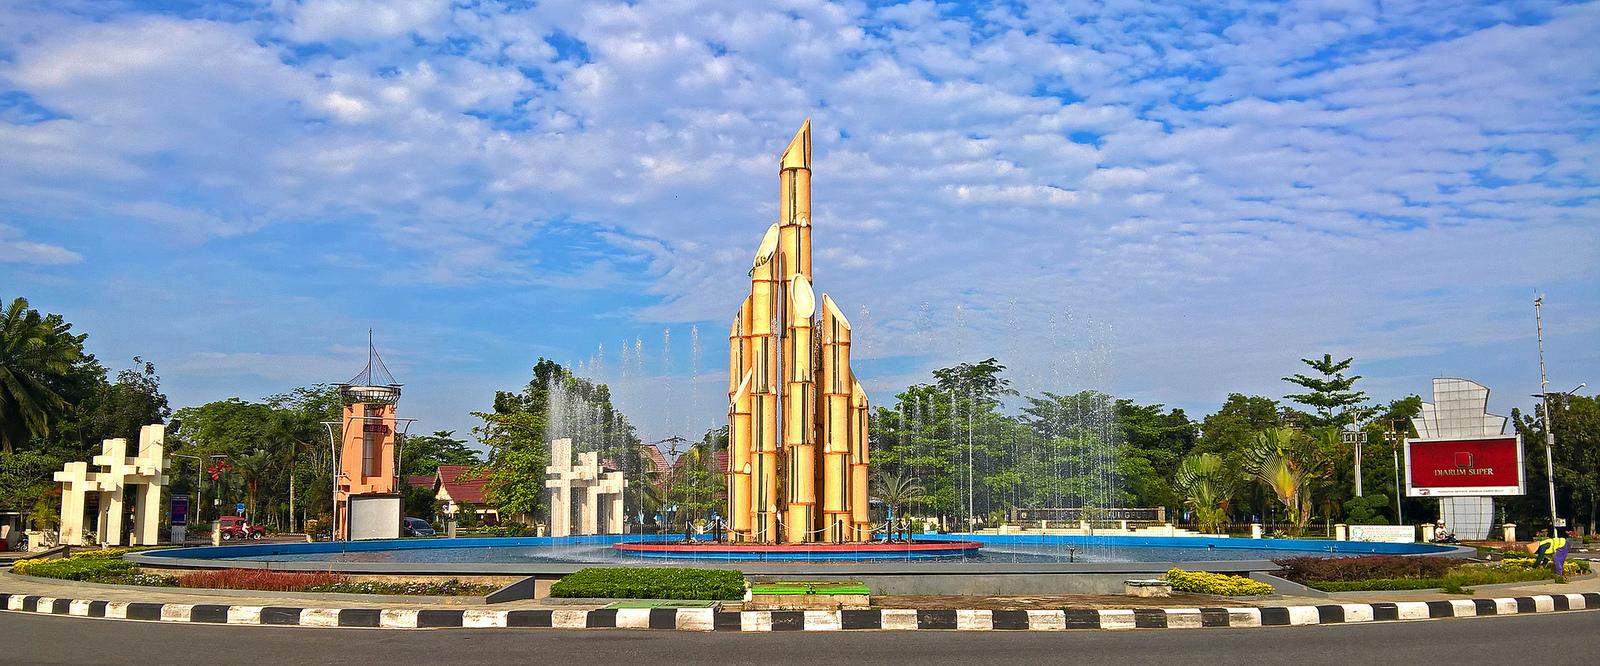 Bakanekobaka Galeri Kota Pontianak Kab Kubu Raya April 2016 Monumen